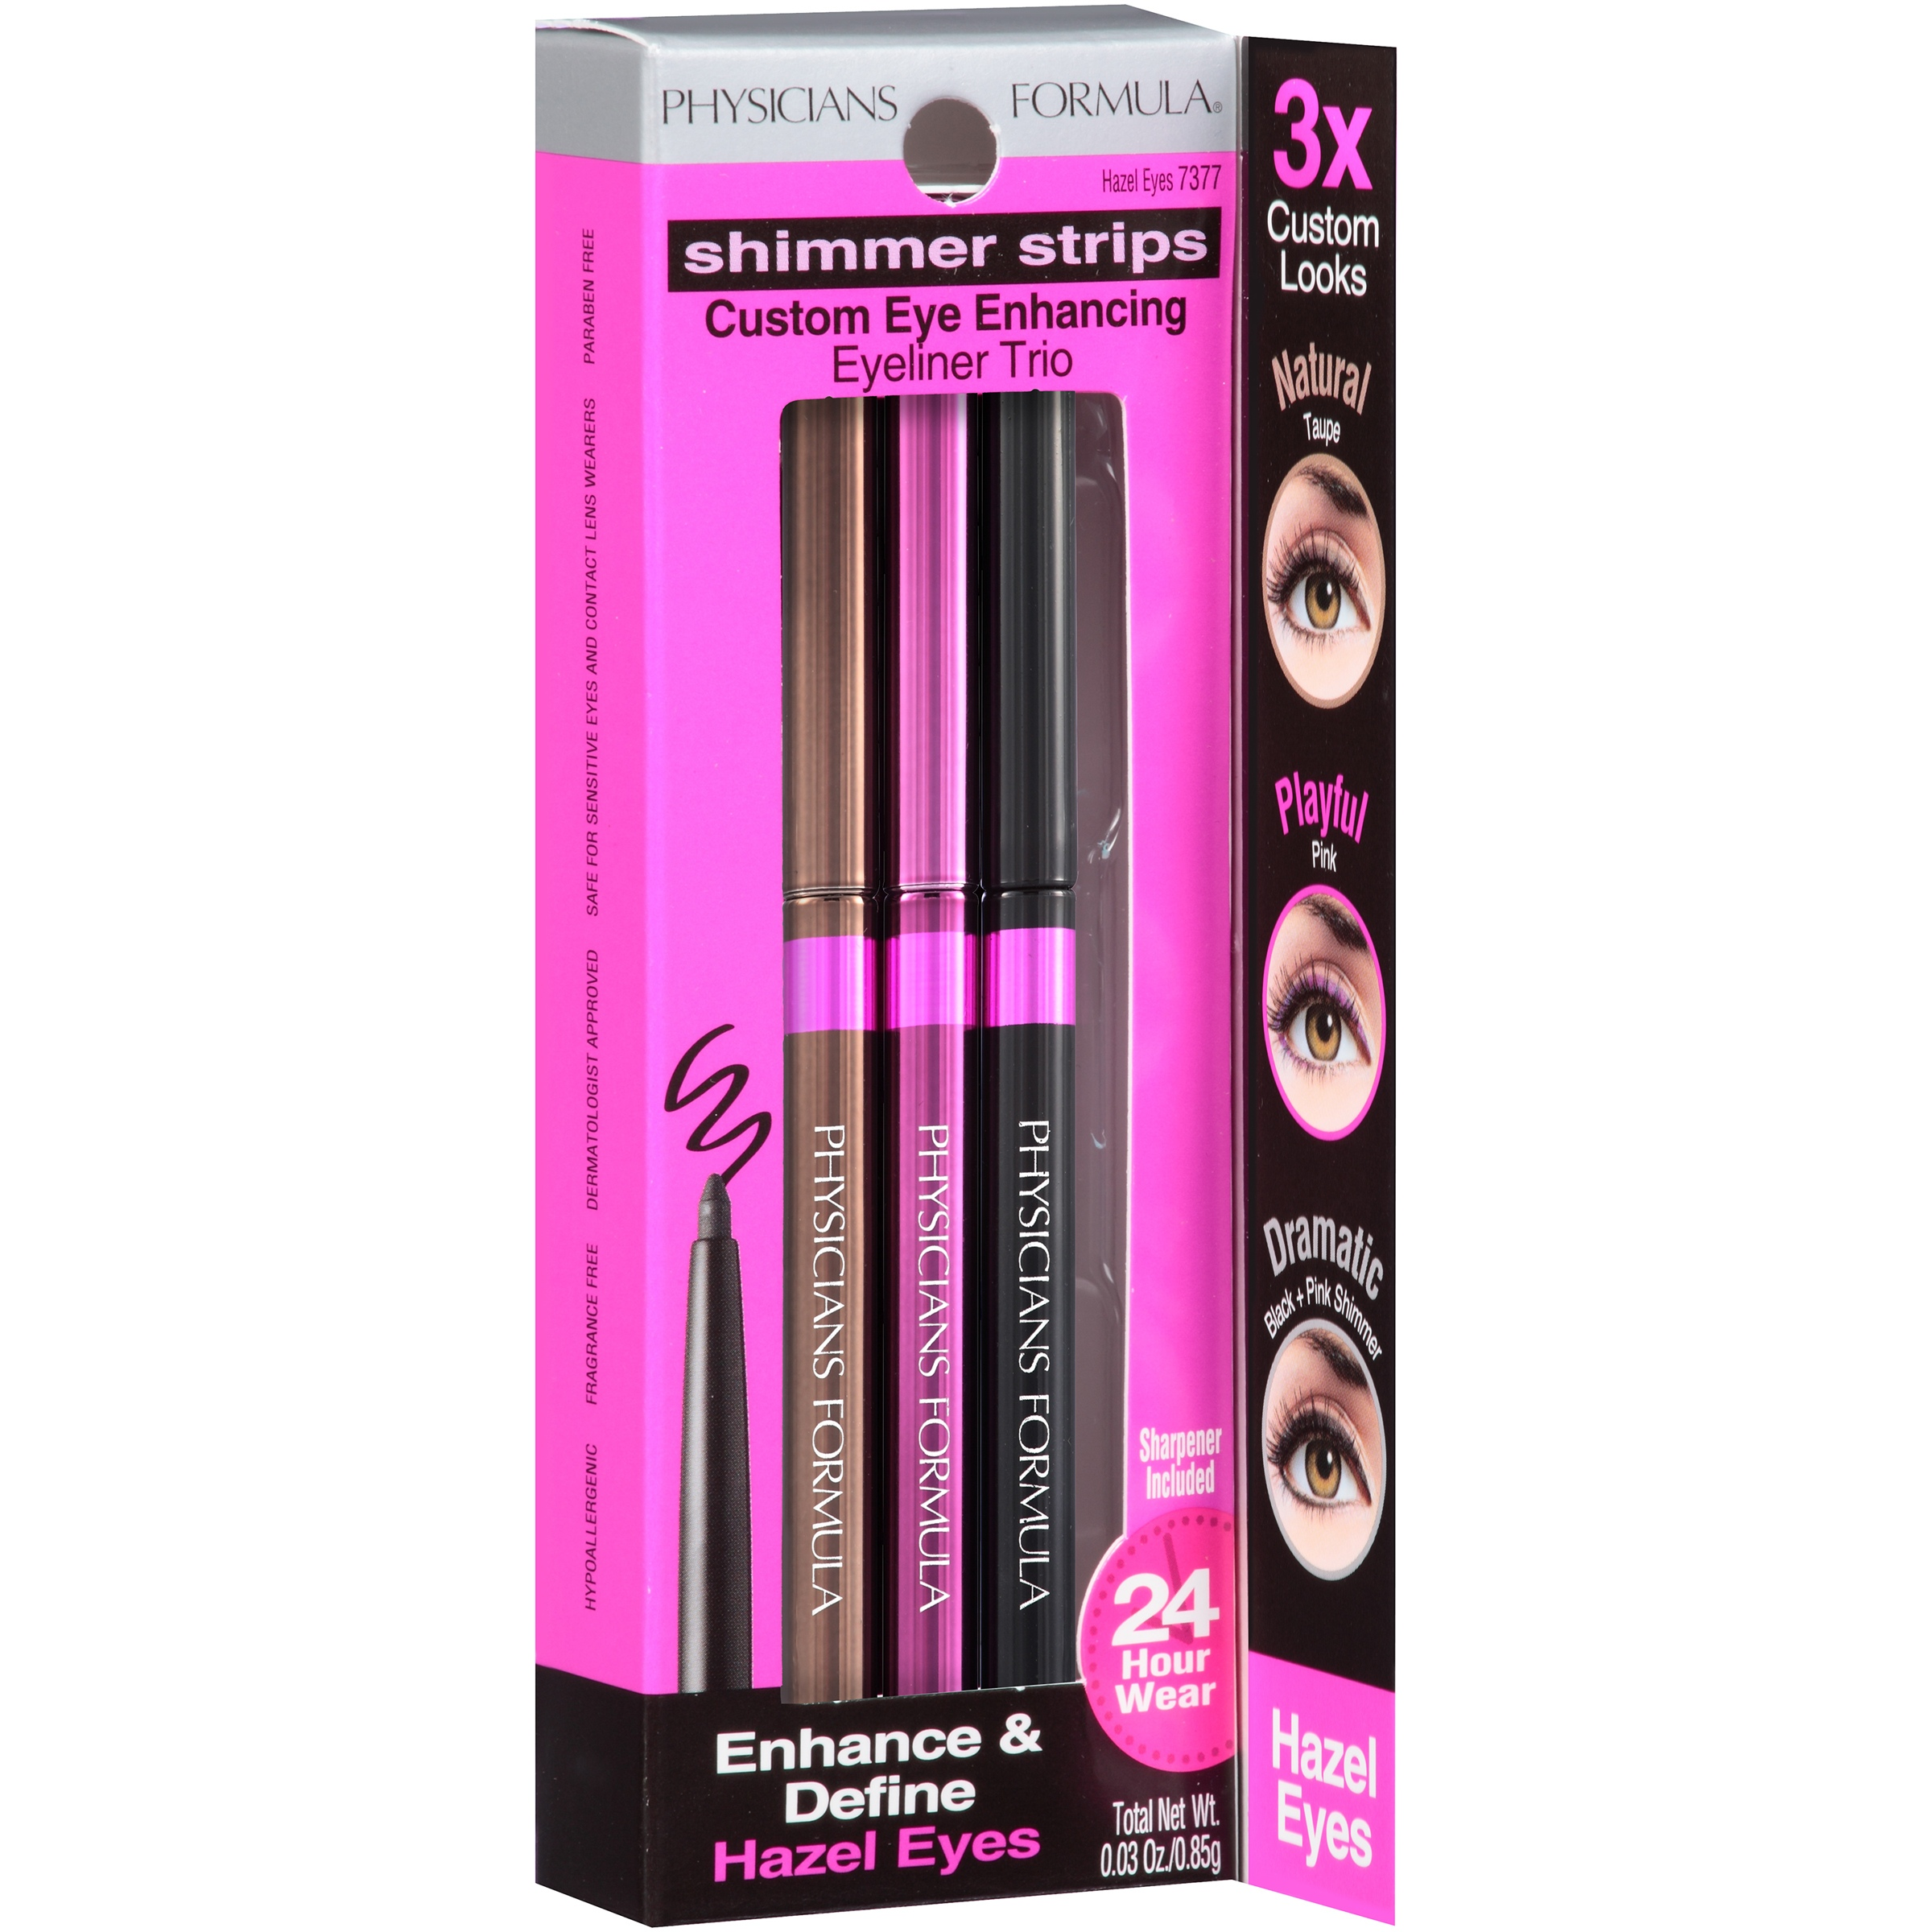 Shimmer Strips Haxel eyes Custom Eye Enhancing Eyeliner Trio 3 ct Box